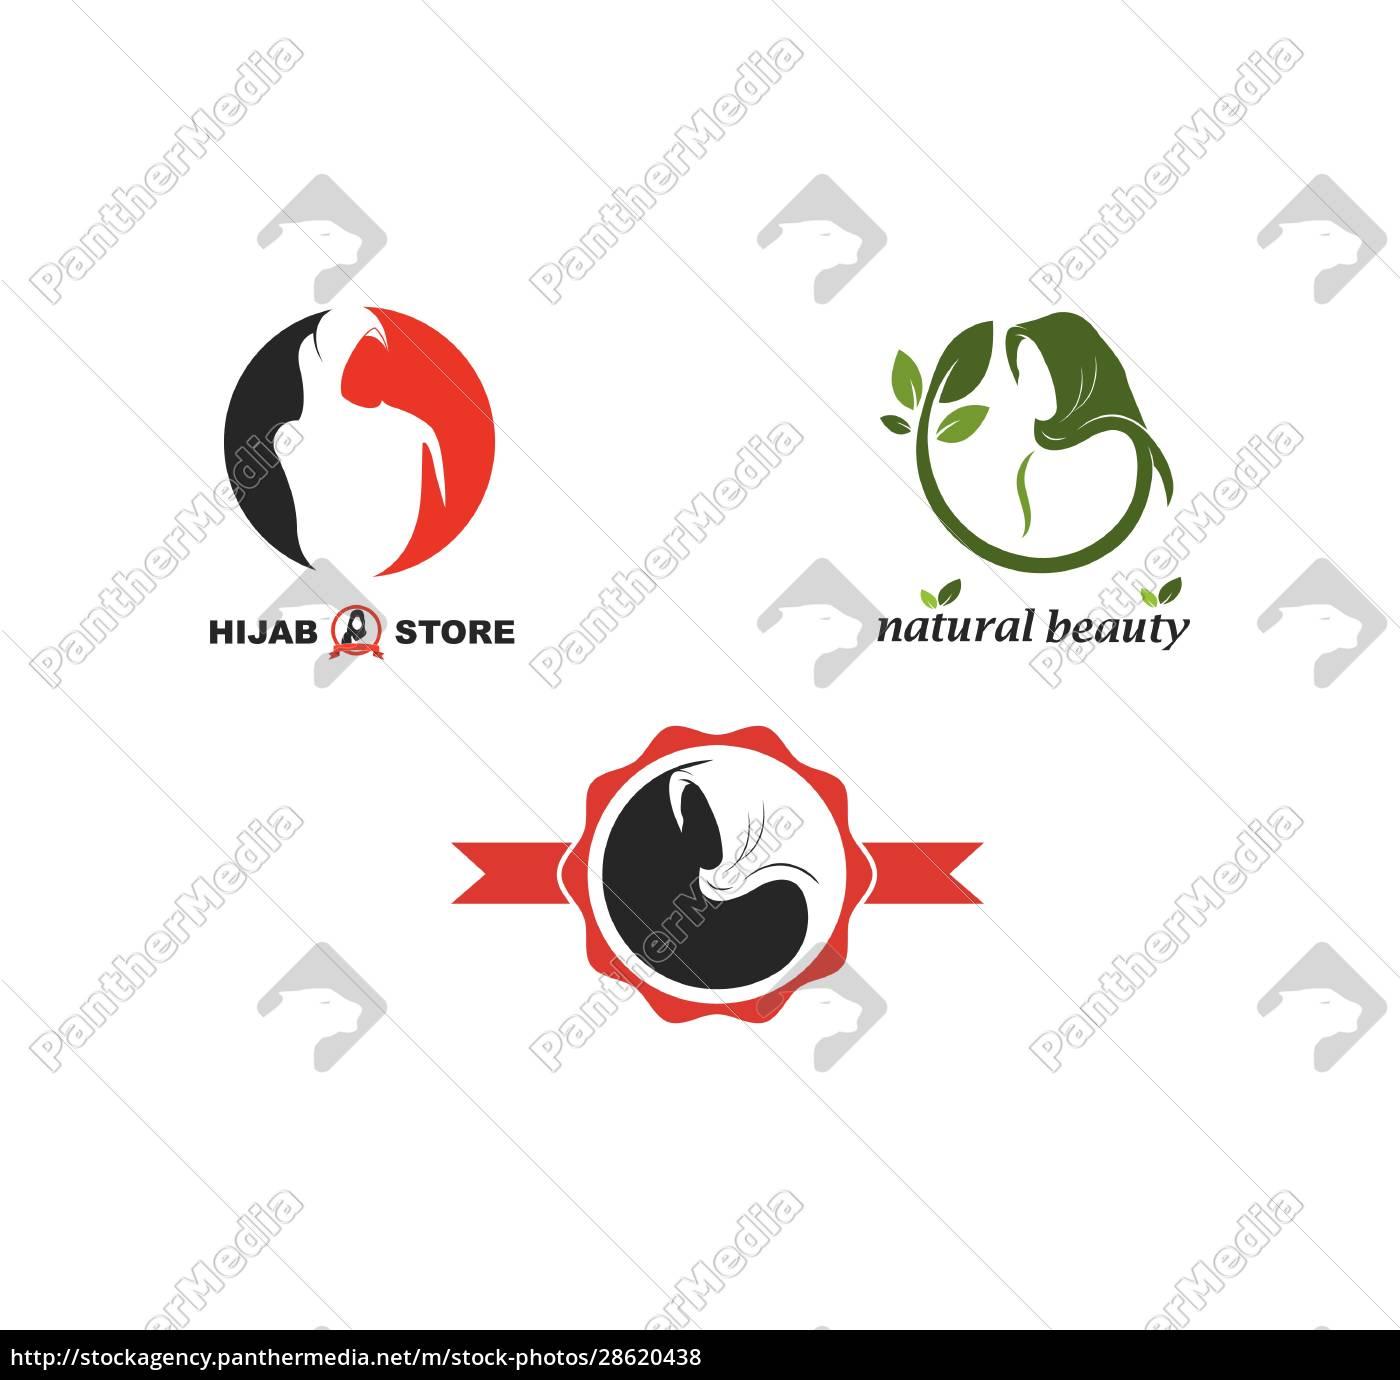 hijab, woman, logo, vector, culture, of, woman - 28620438